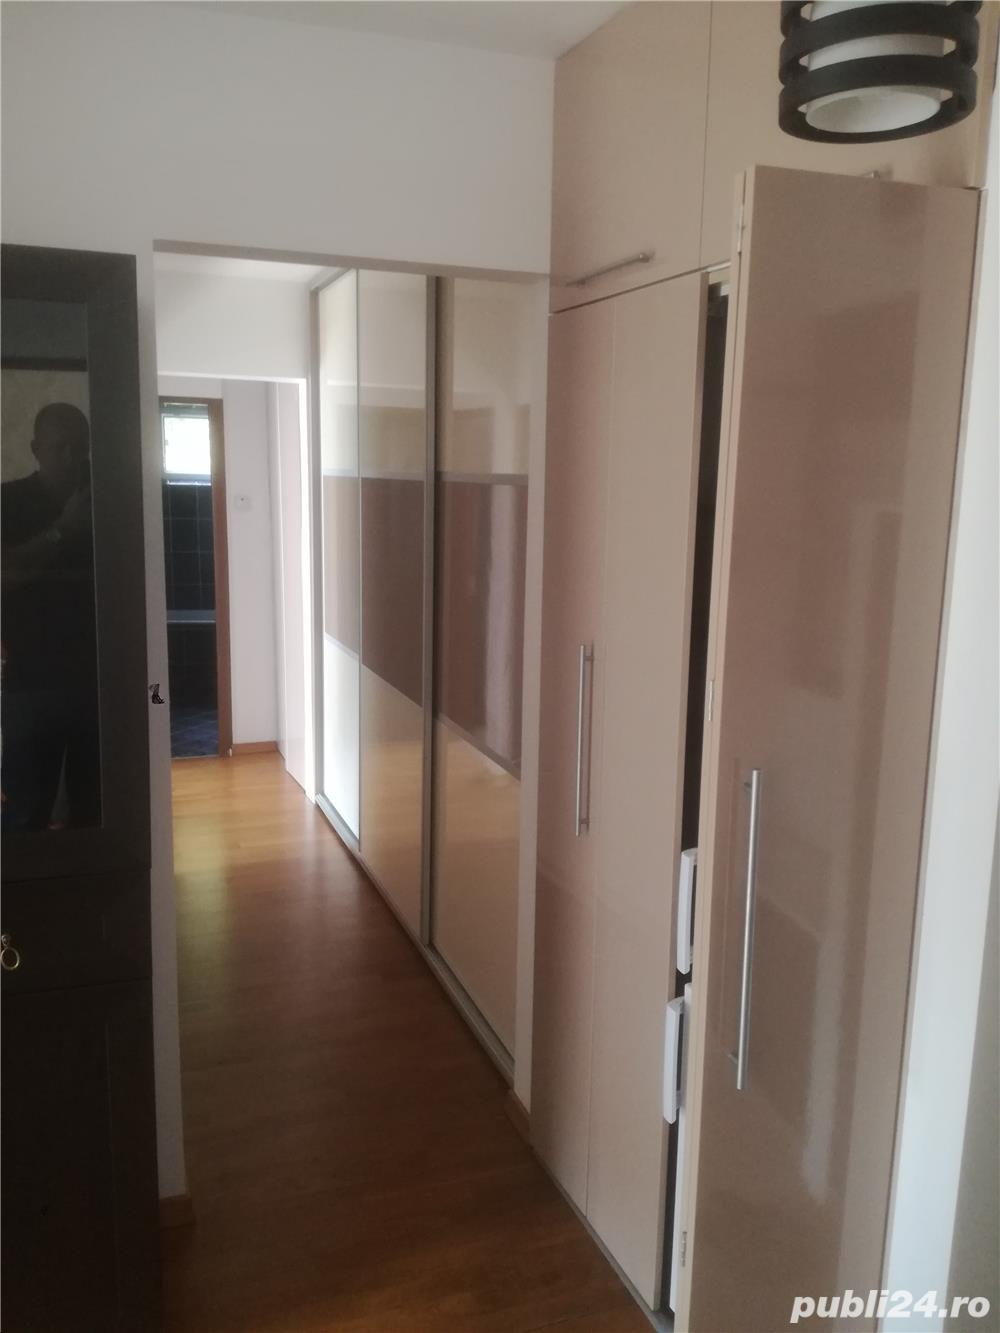 Inchiriez apartament 3 camere!